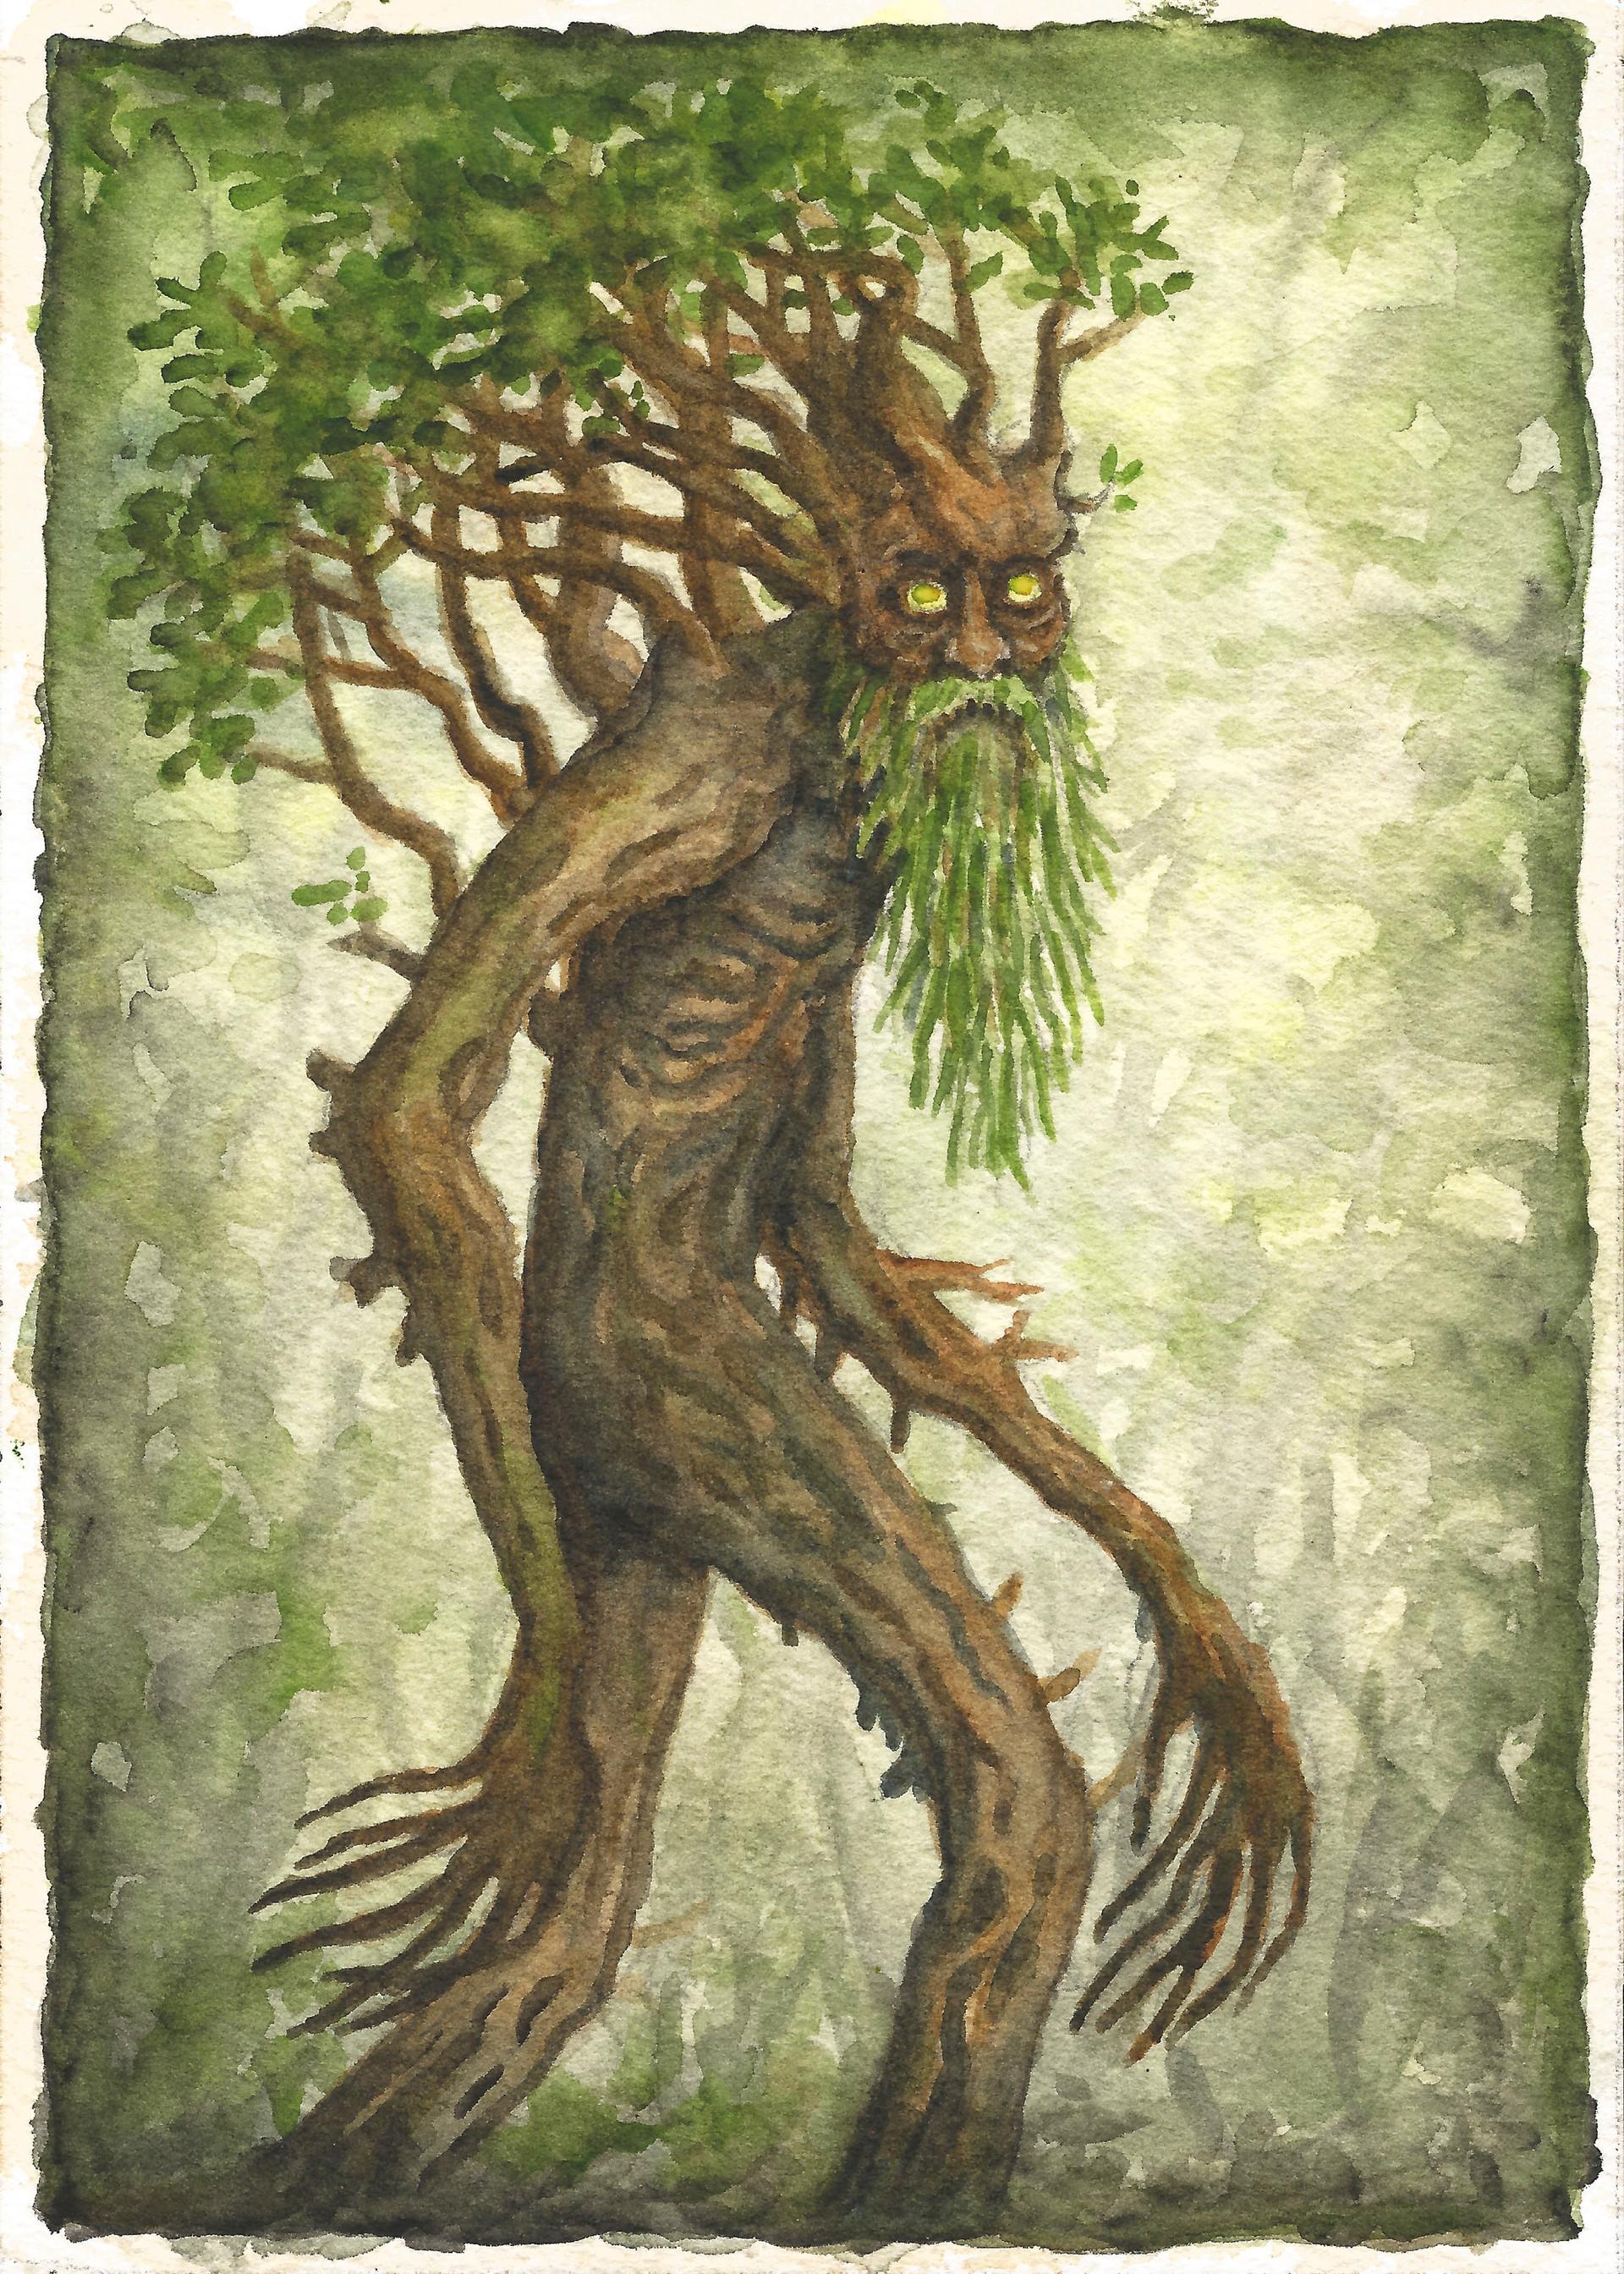 Patrick weck lotr 3 treebeard print 2